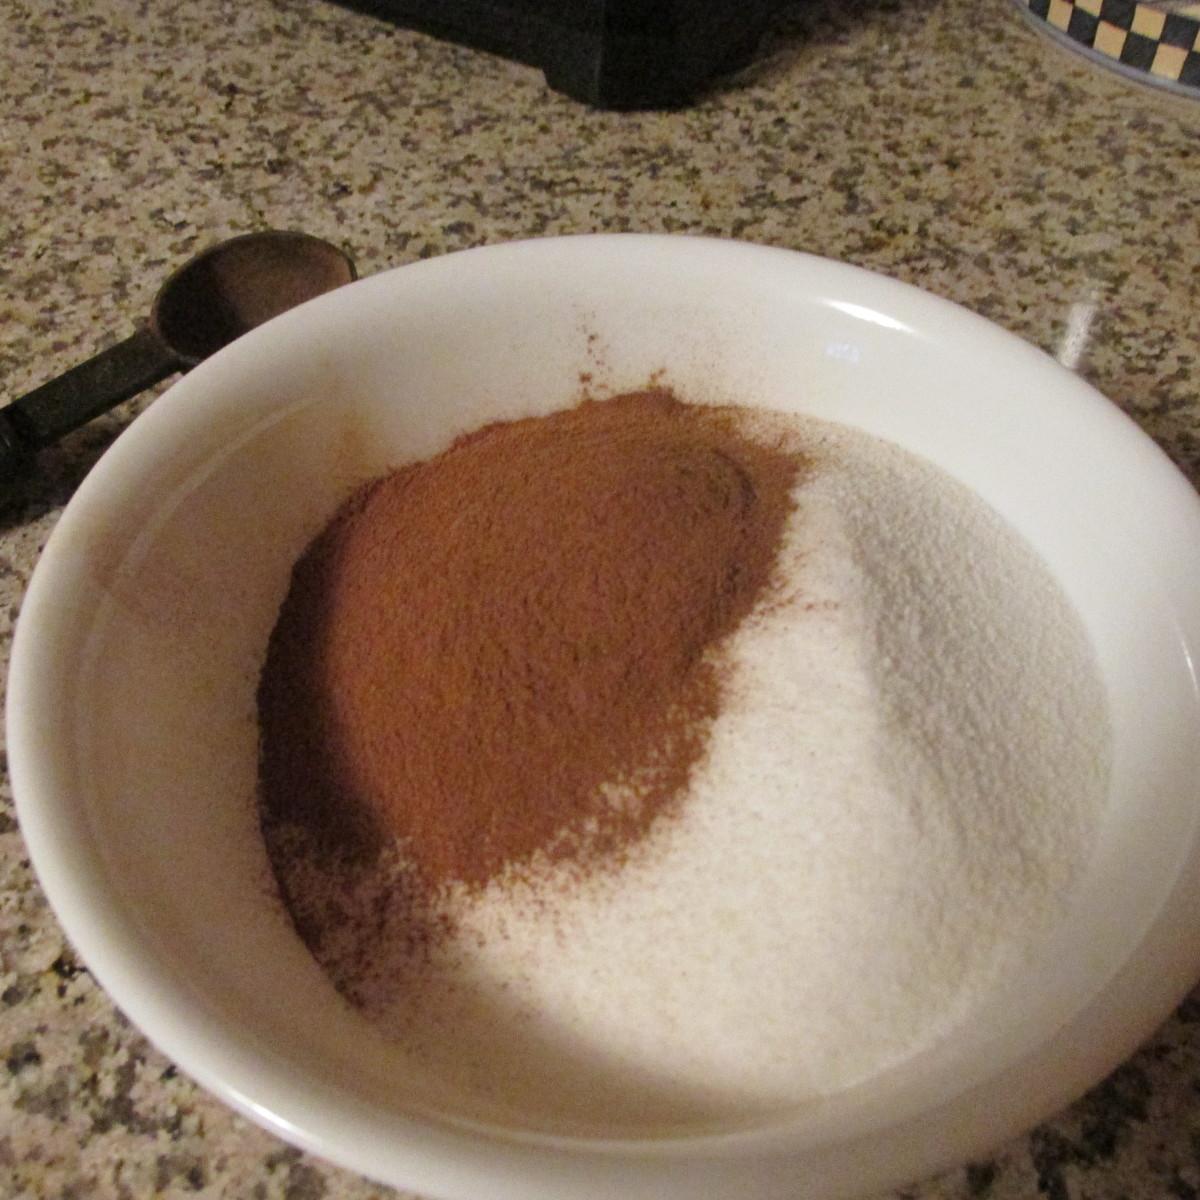 Cinnamon and sugar.